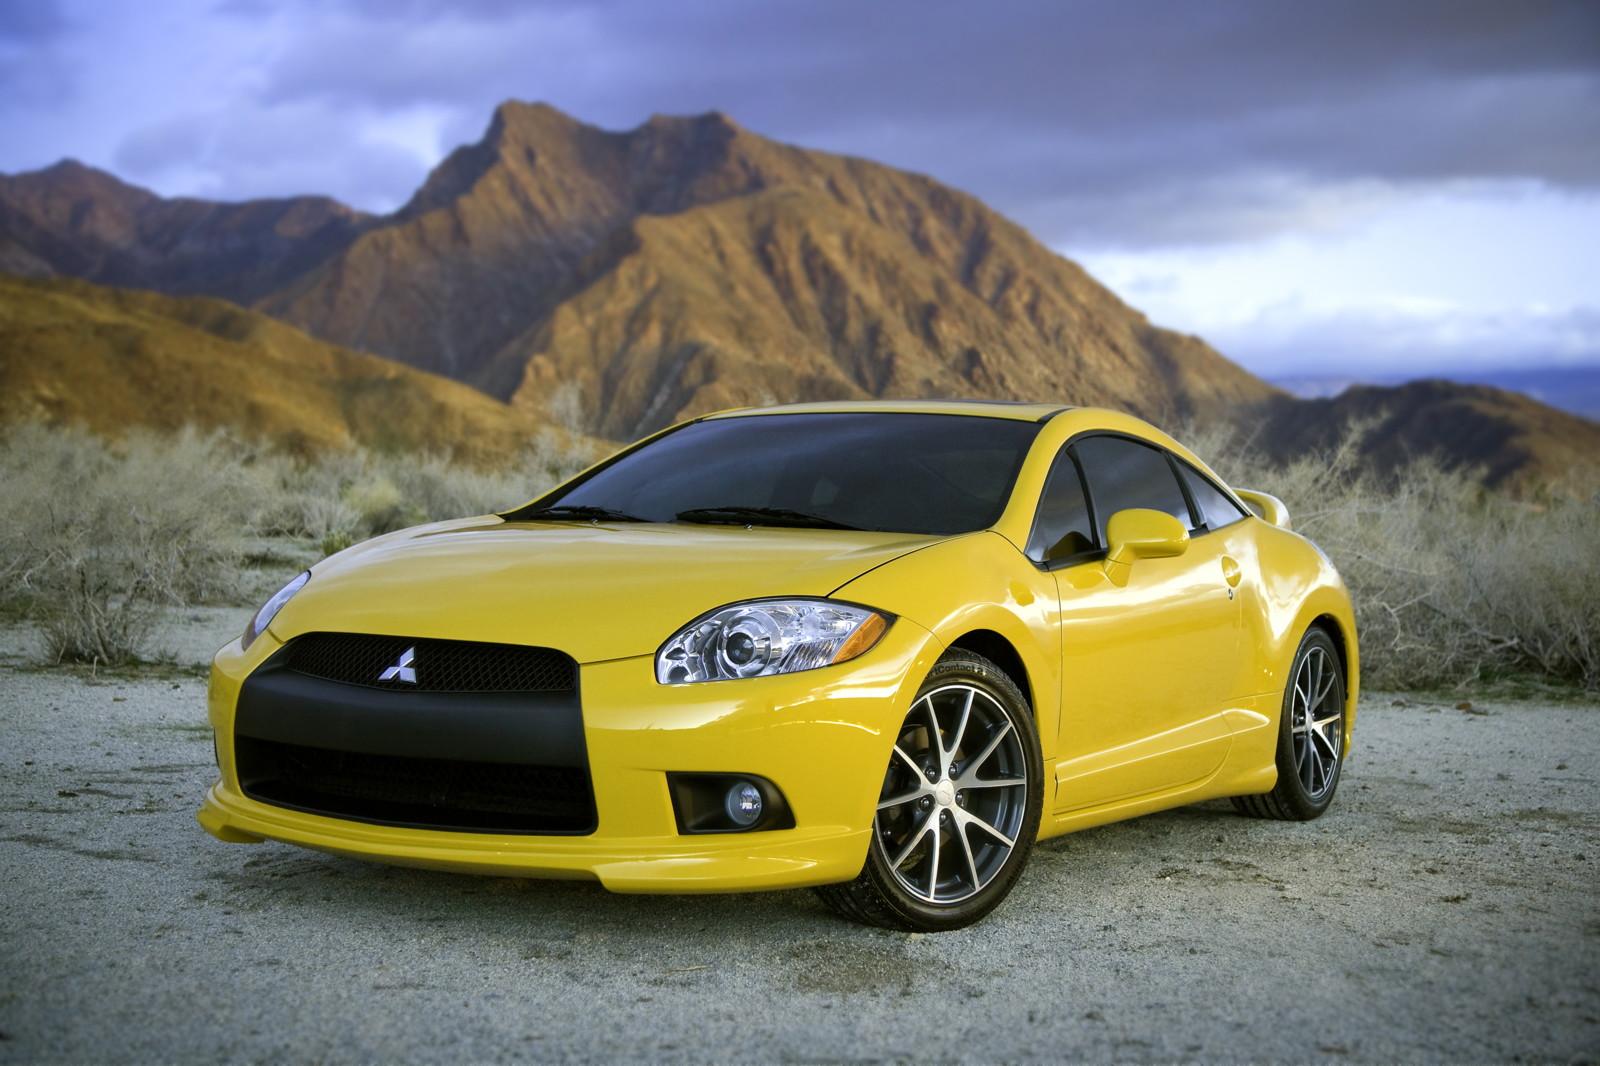 Mitsubishi Eclipse Used Car Prices